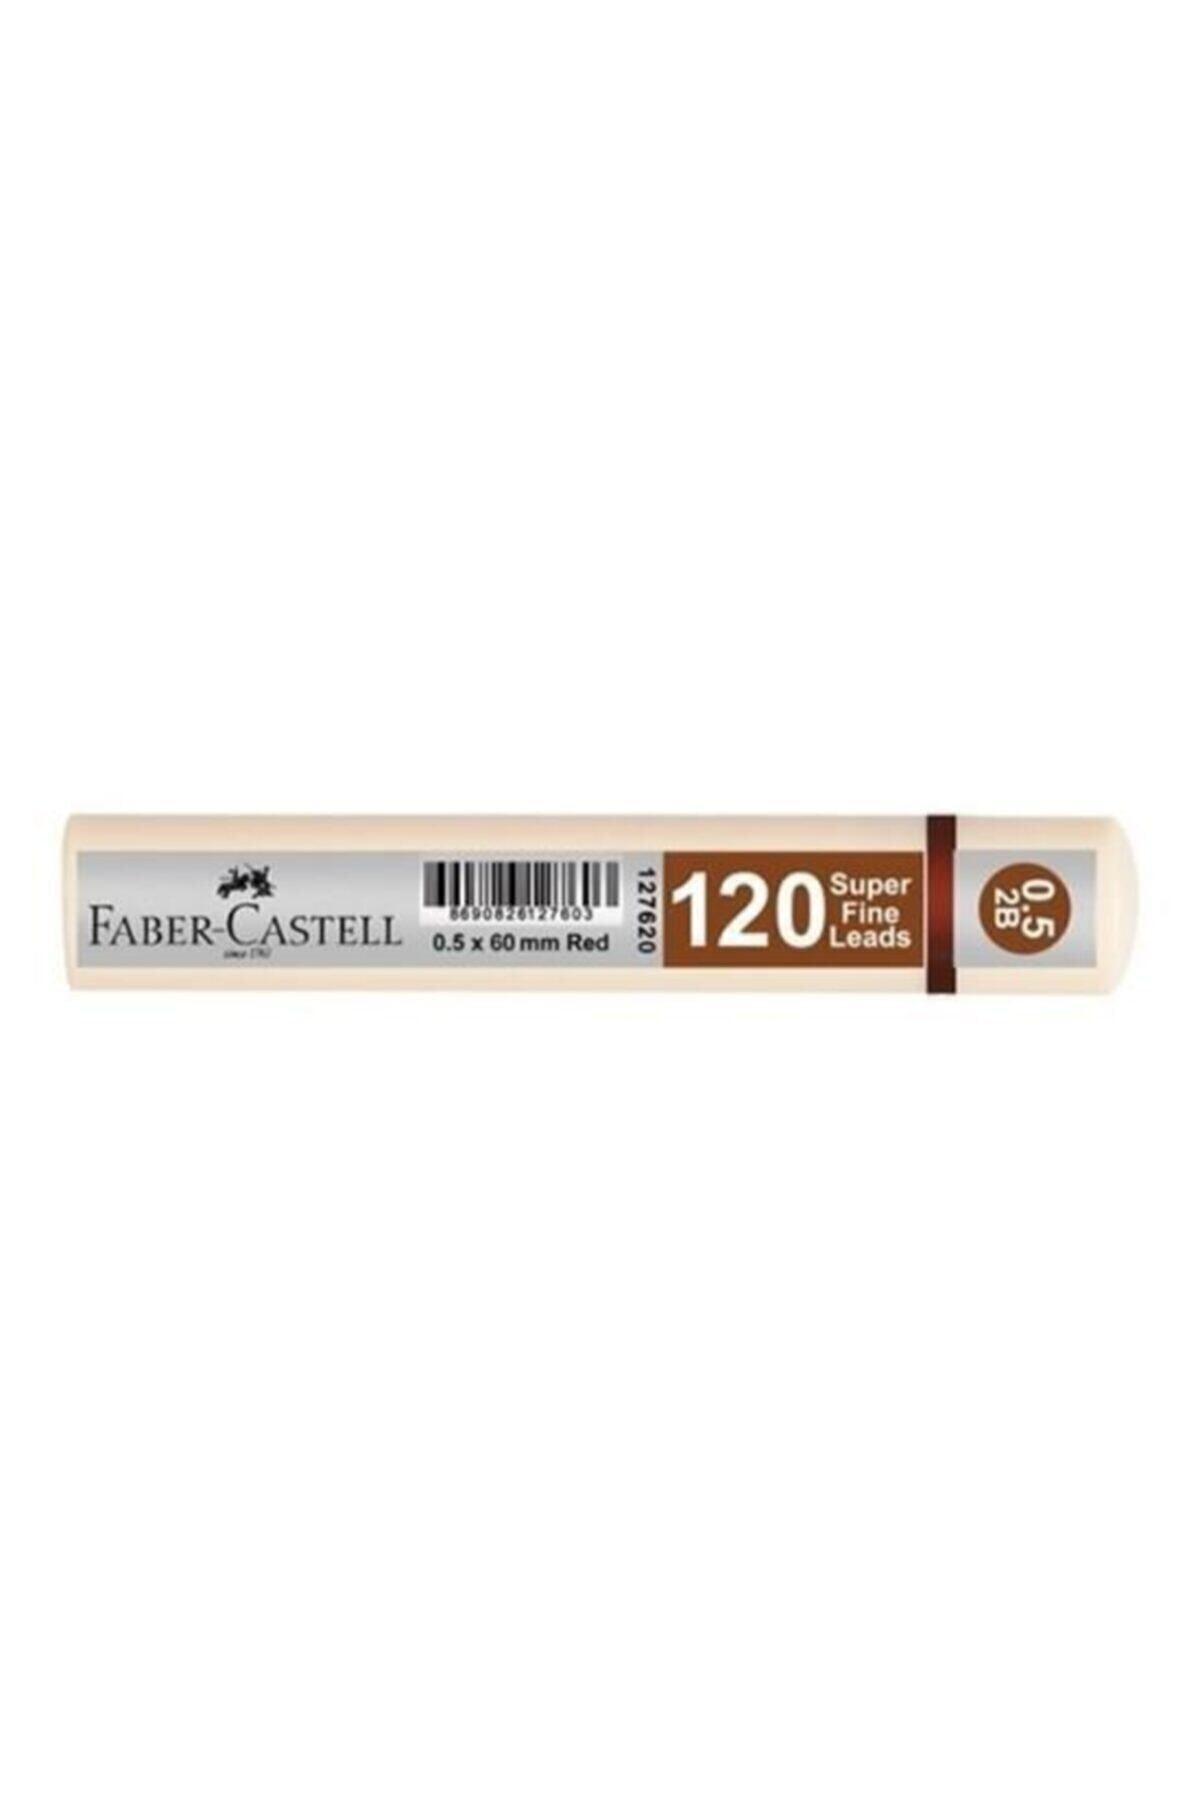 Faber Castell Faber Castel 120 Li Uç 0.5 Tüp 127723 Beyaz 1